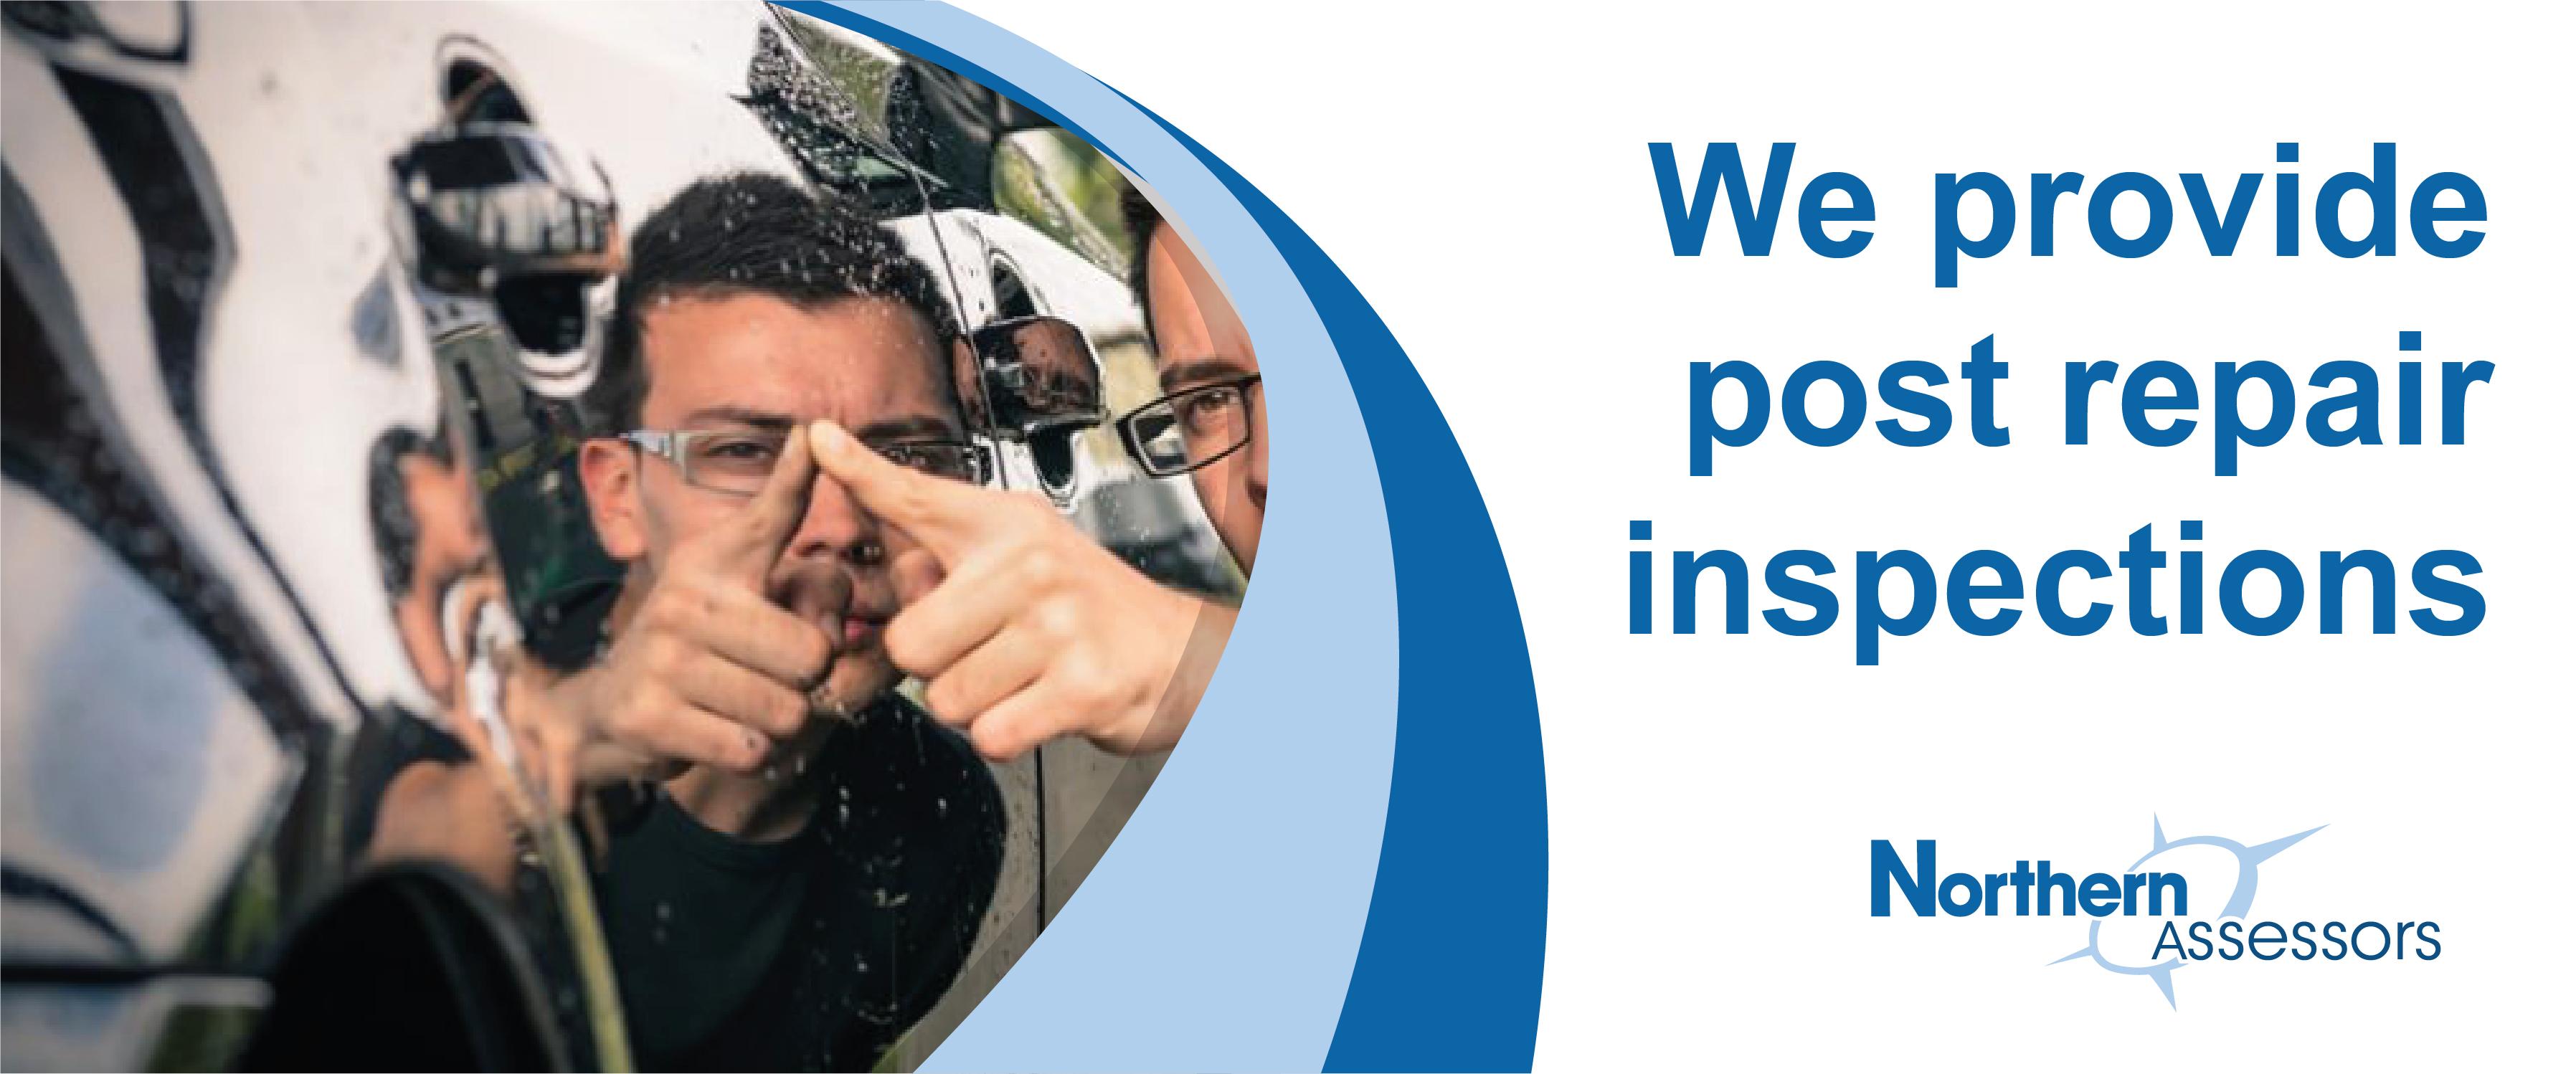 We provide post repair inspections